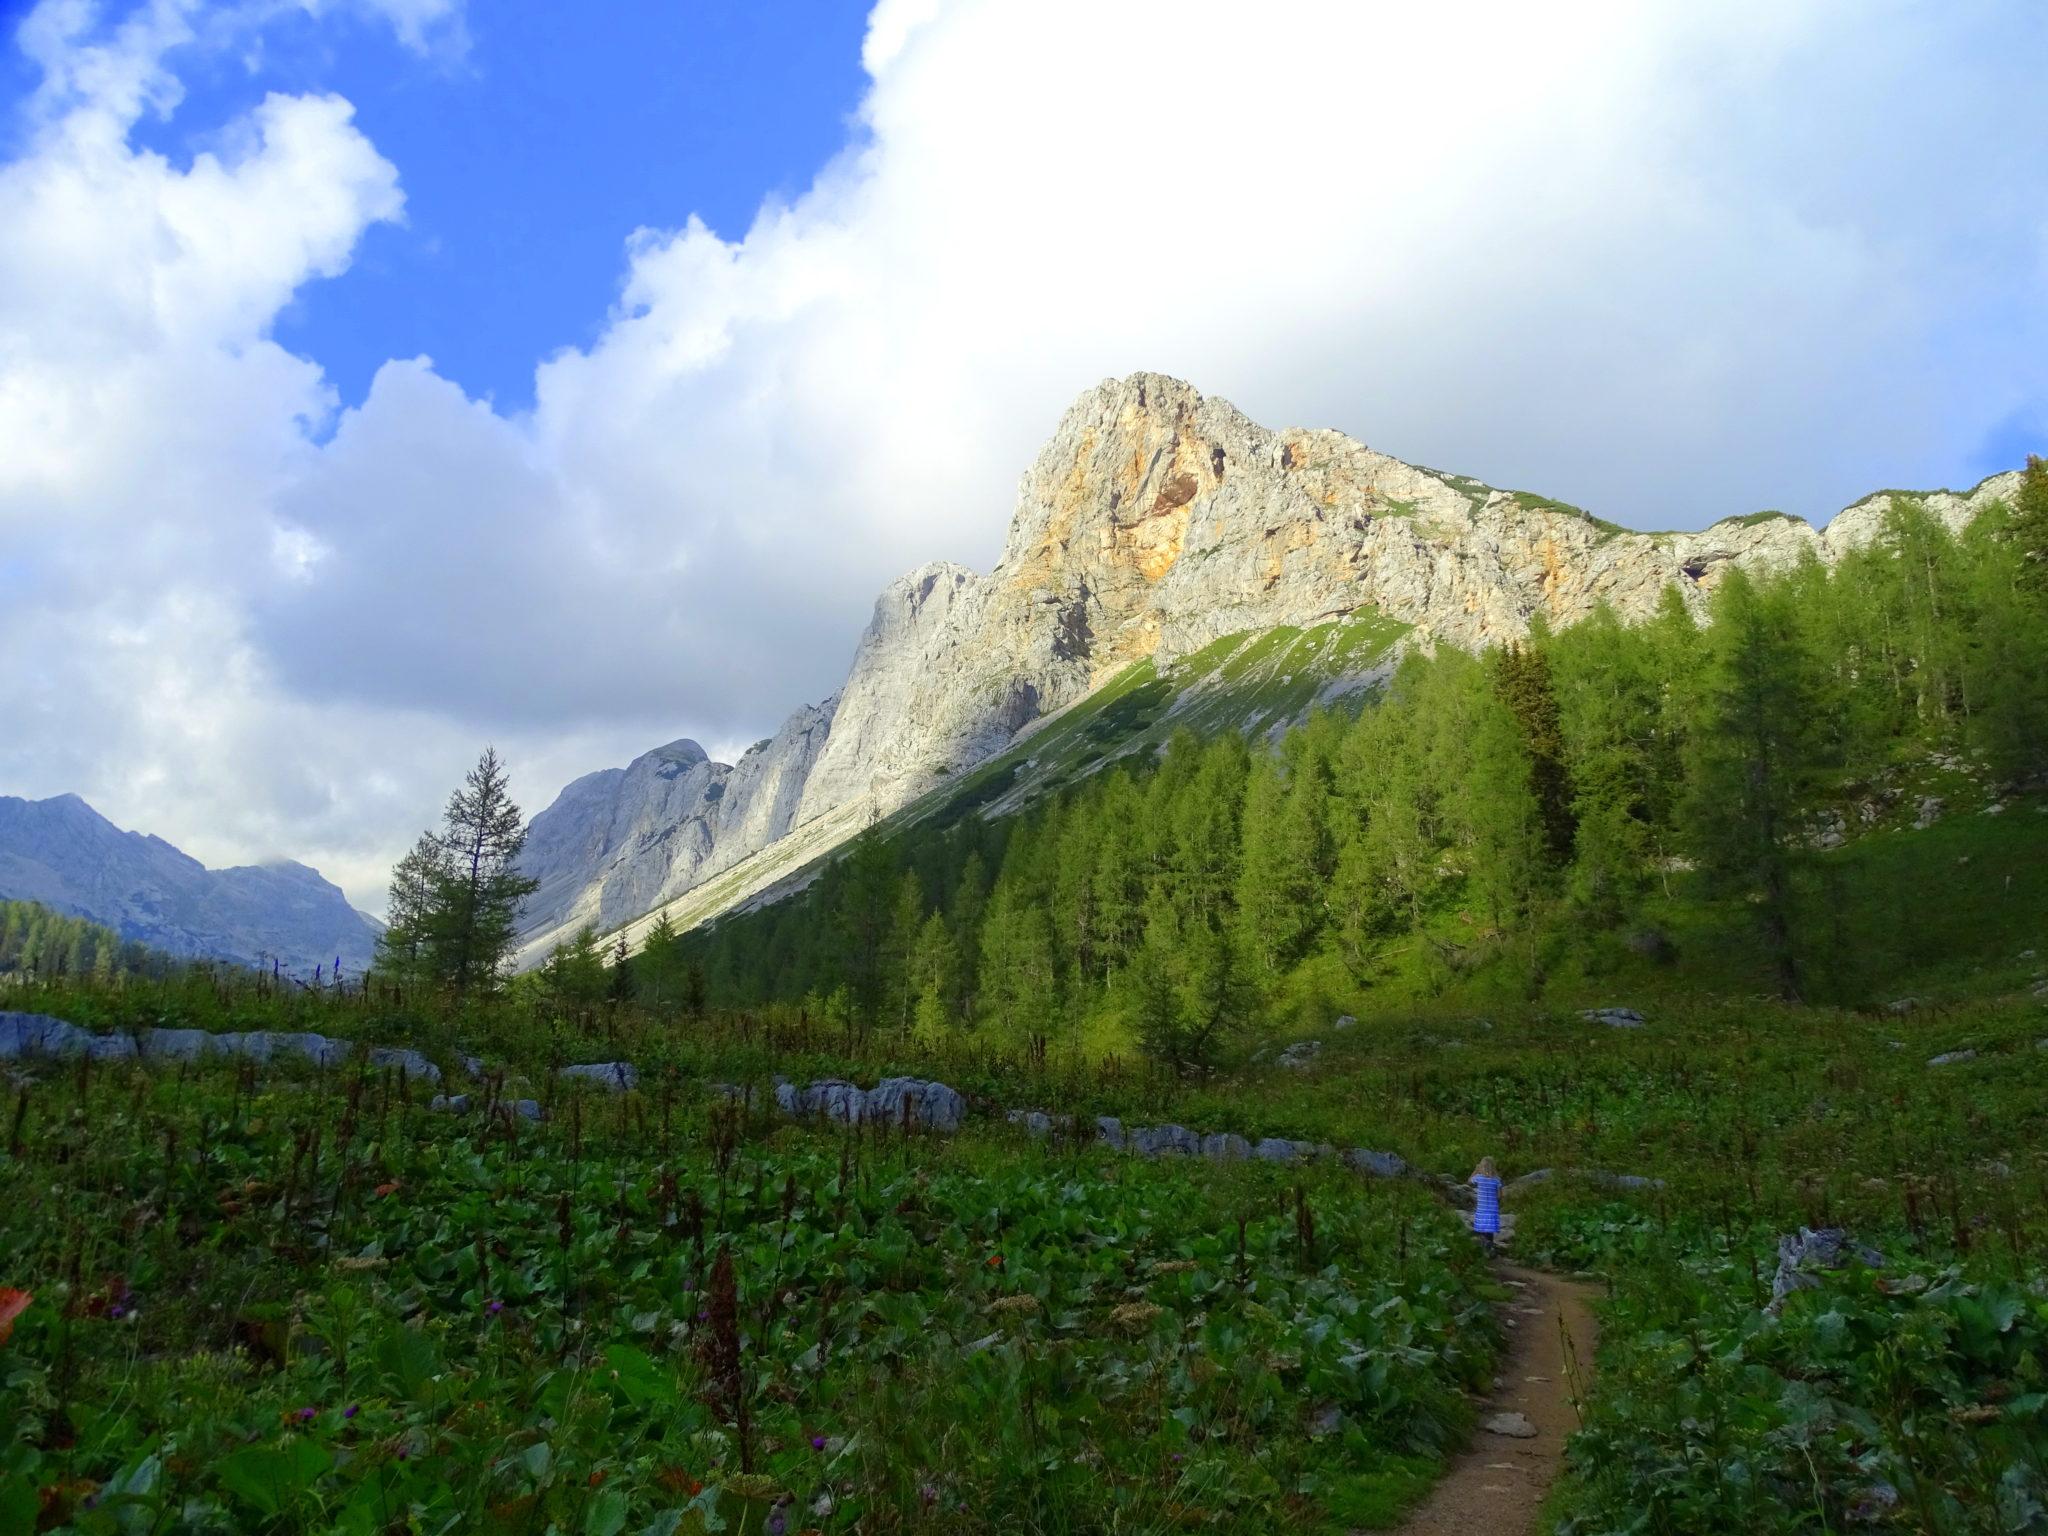 Entering the Triglav Lakes Valley felt like walking into a fairytale.